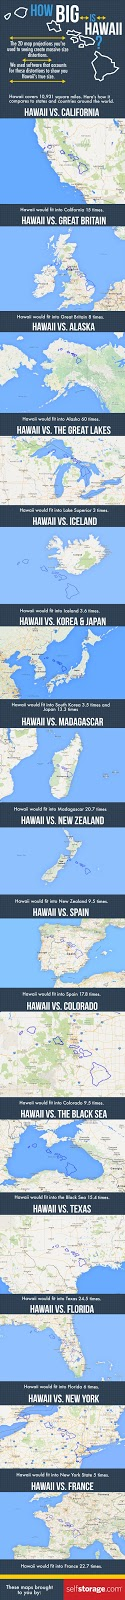 http://moving.selfstorage.com/wp-content/uploads/2016/04/how-big-is-hawaii.jpg